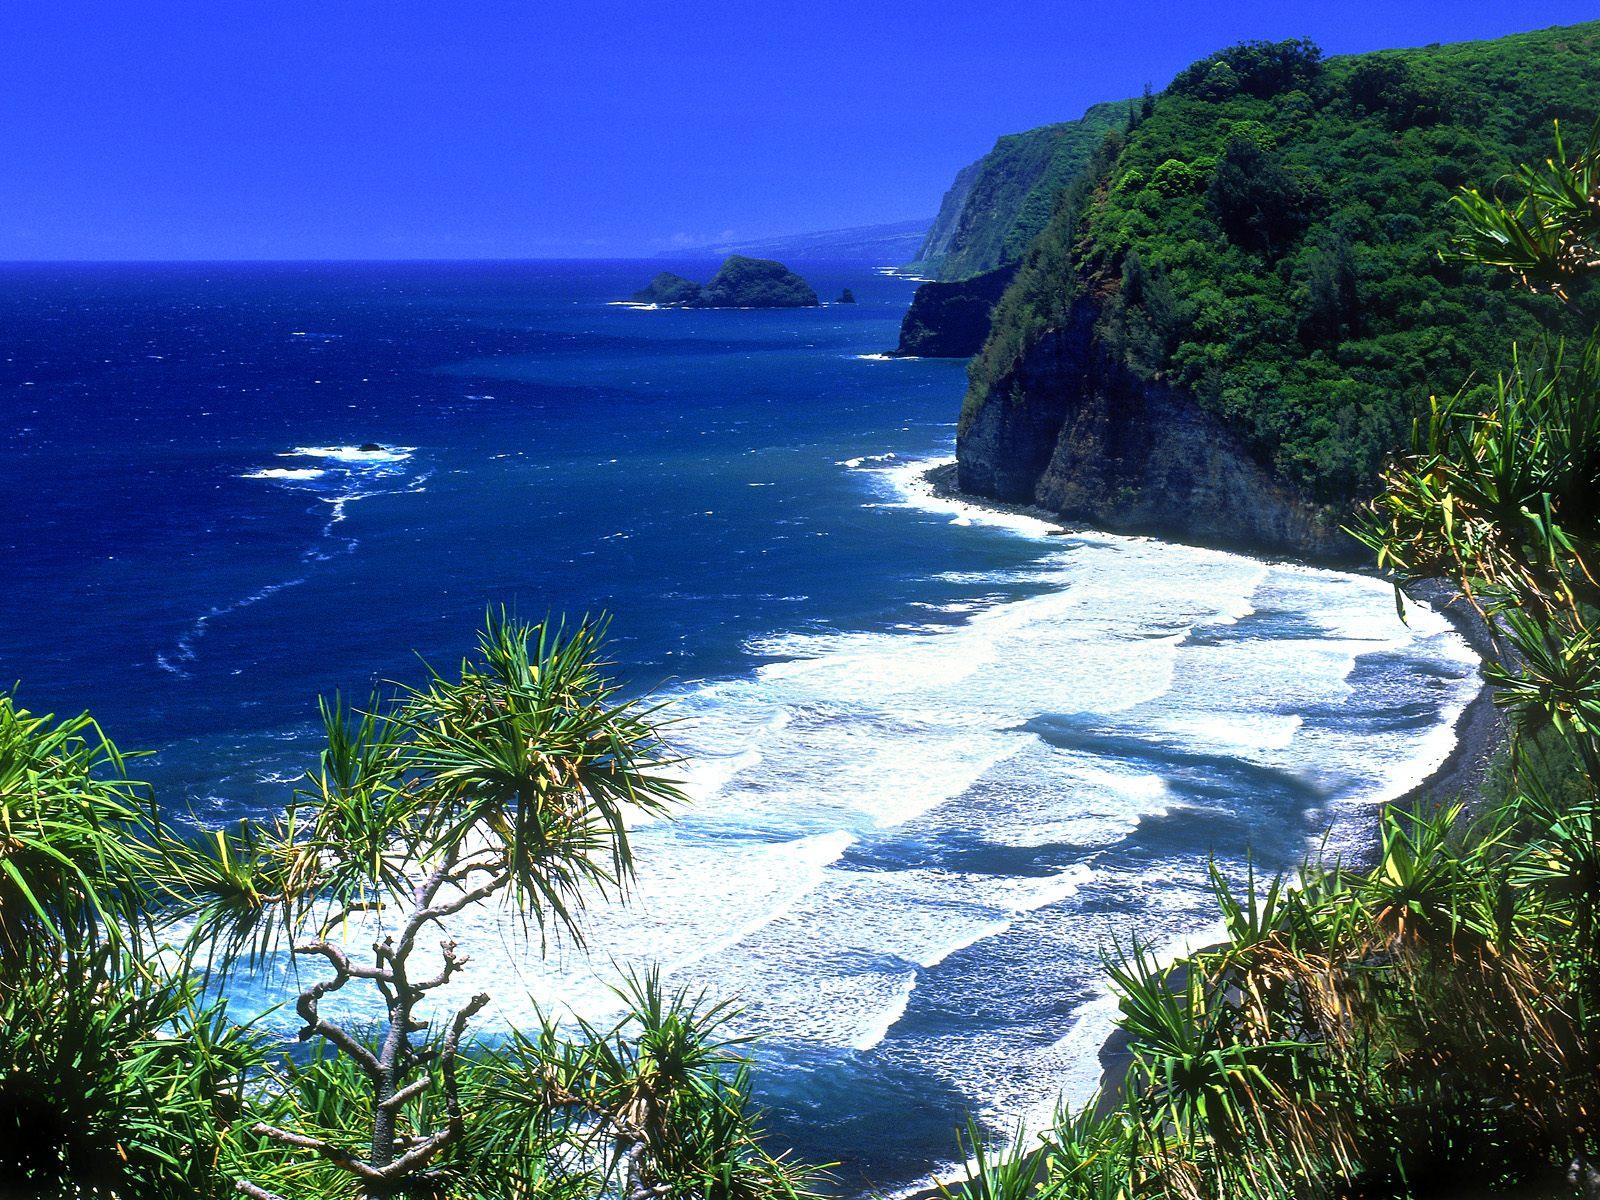 Hawaii, Central America 3